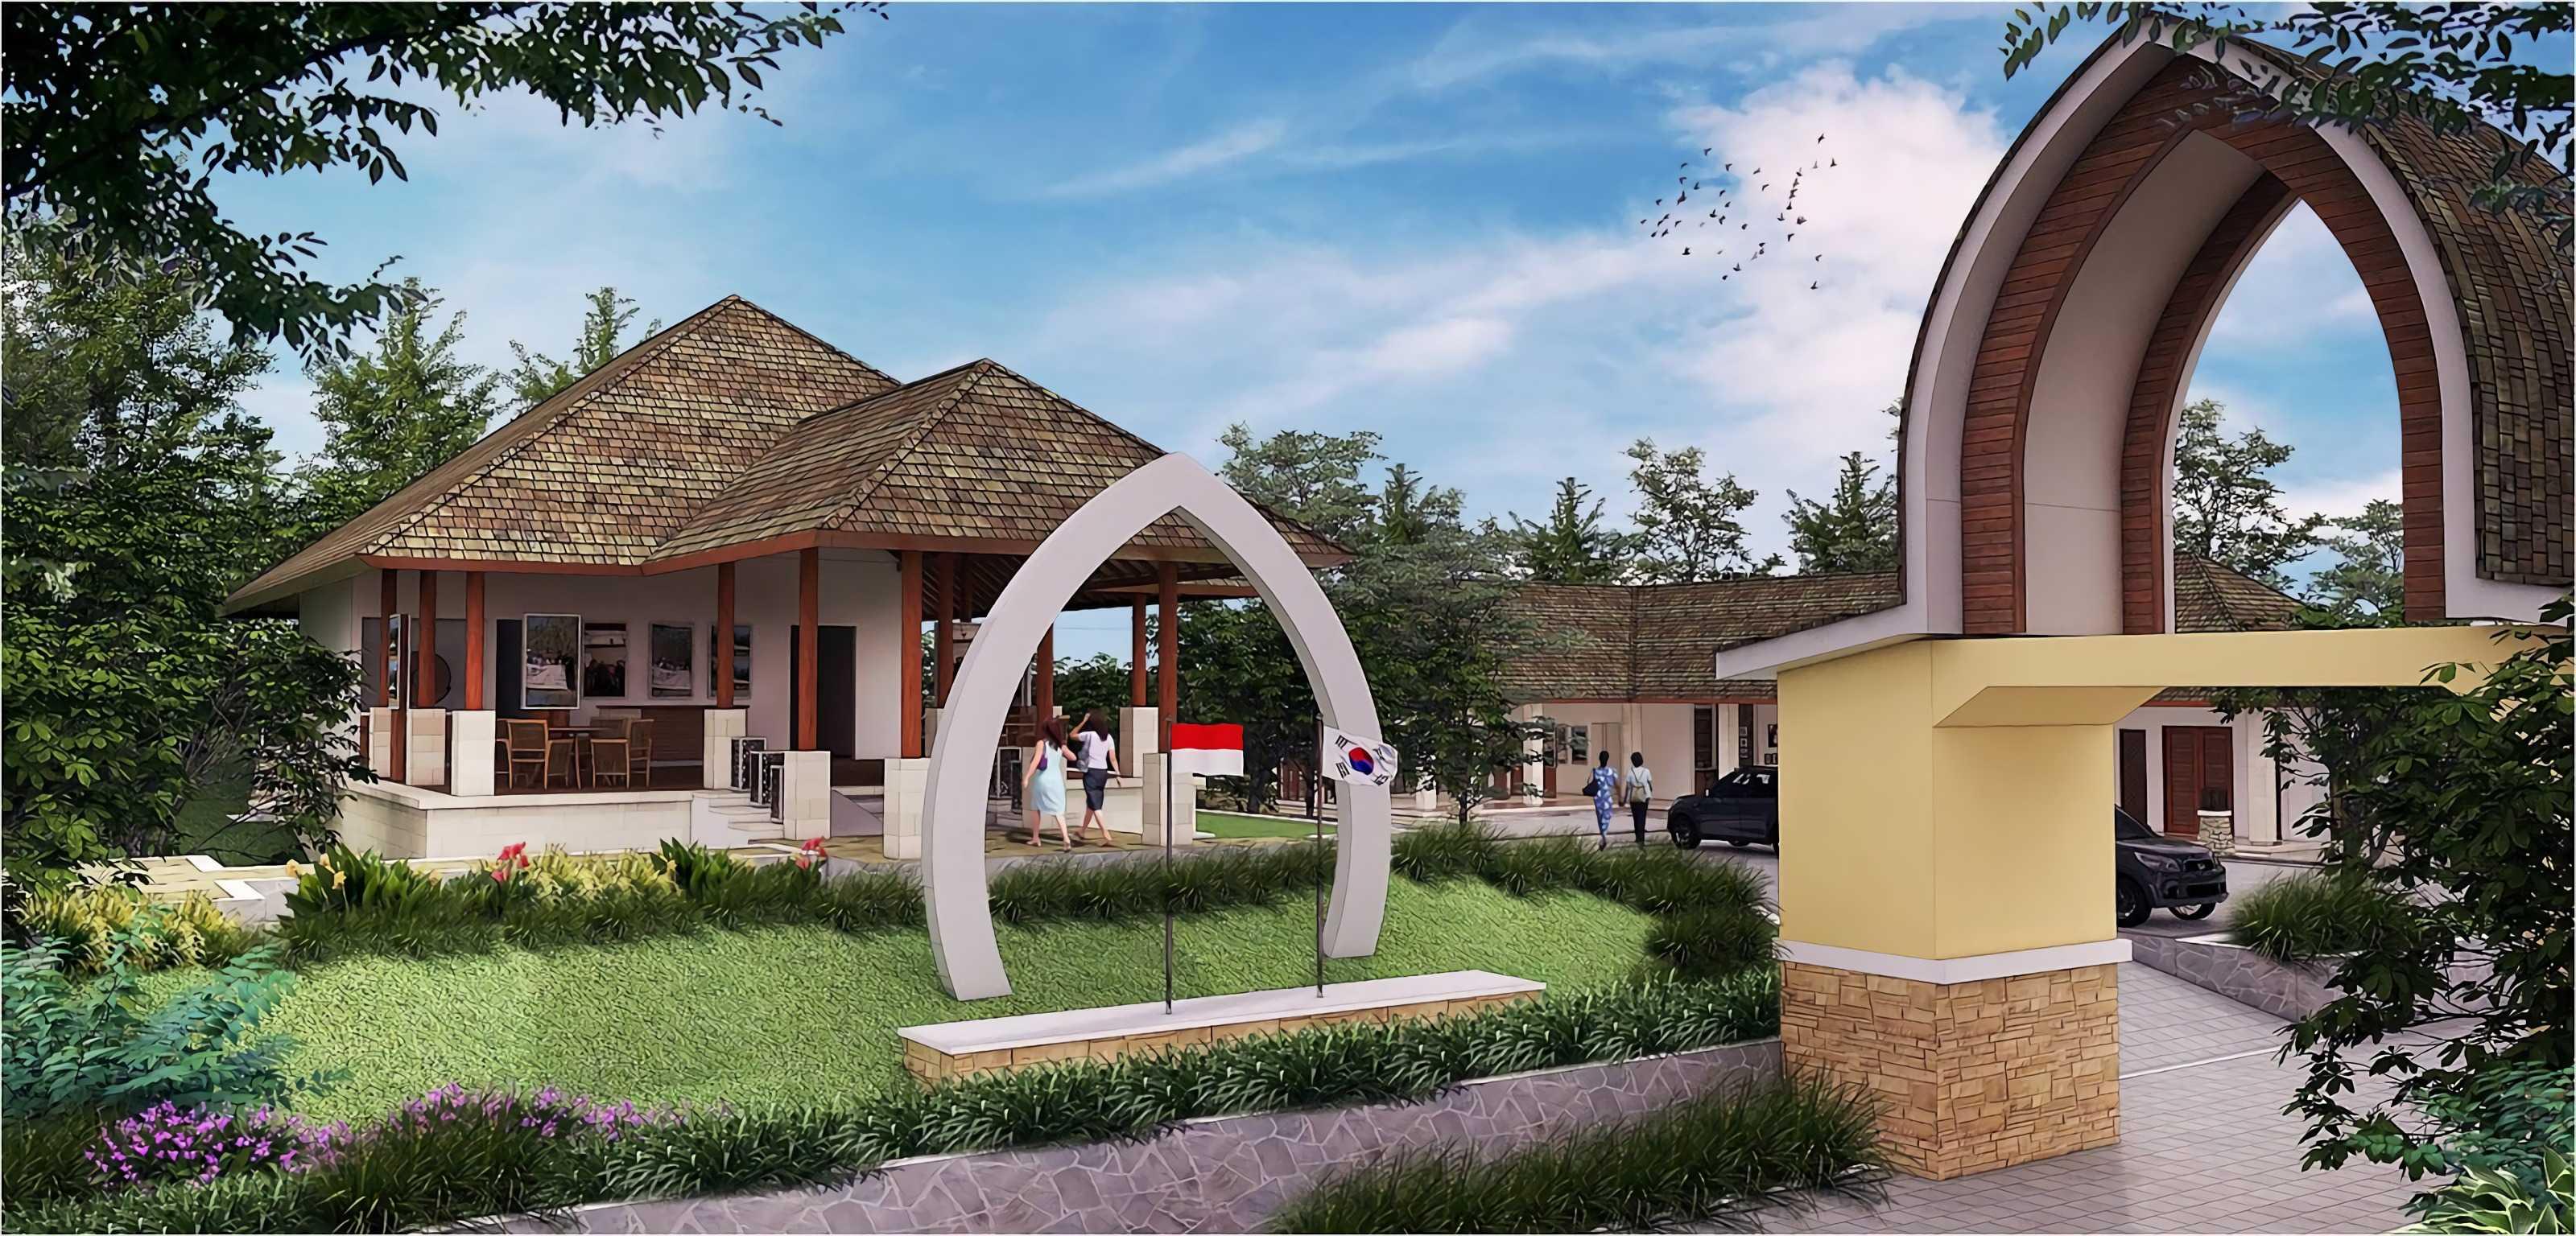 Hg Architects & Designers Associates Taman Wisata Alam Gunung Tunak Lombok, Ntb Lombok, Ntb Front View   24347